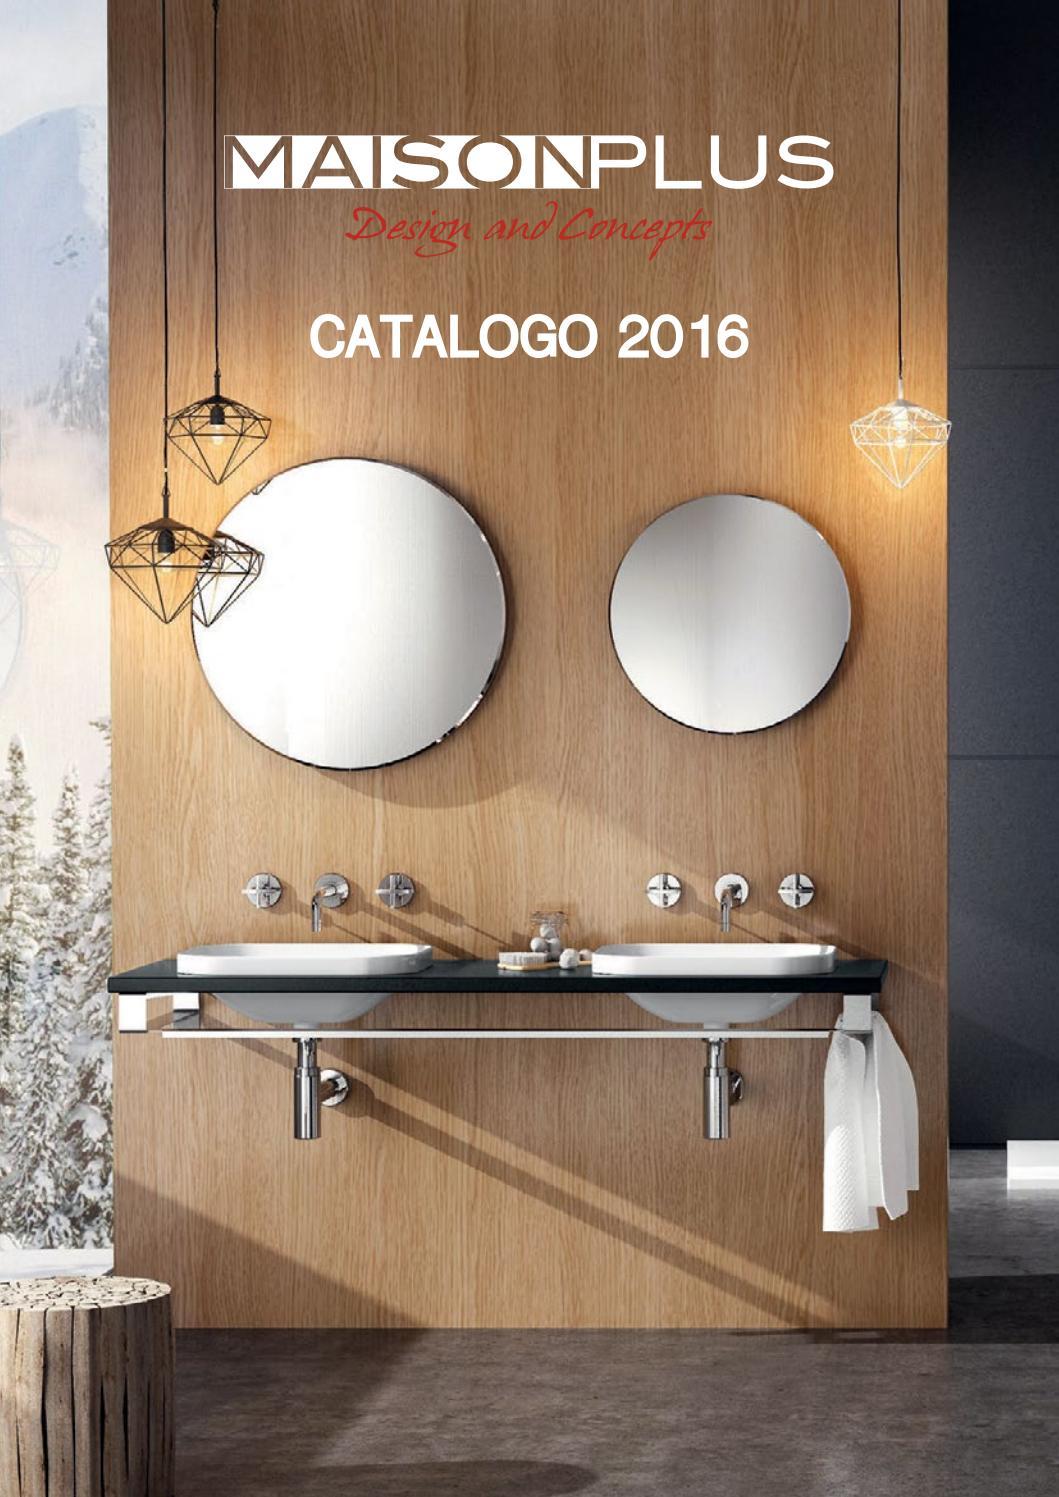 Catalogo MAISON PLUS 2016 by Maison Plus srls - issuu